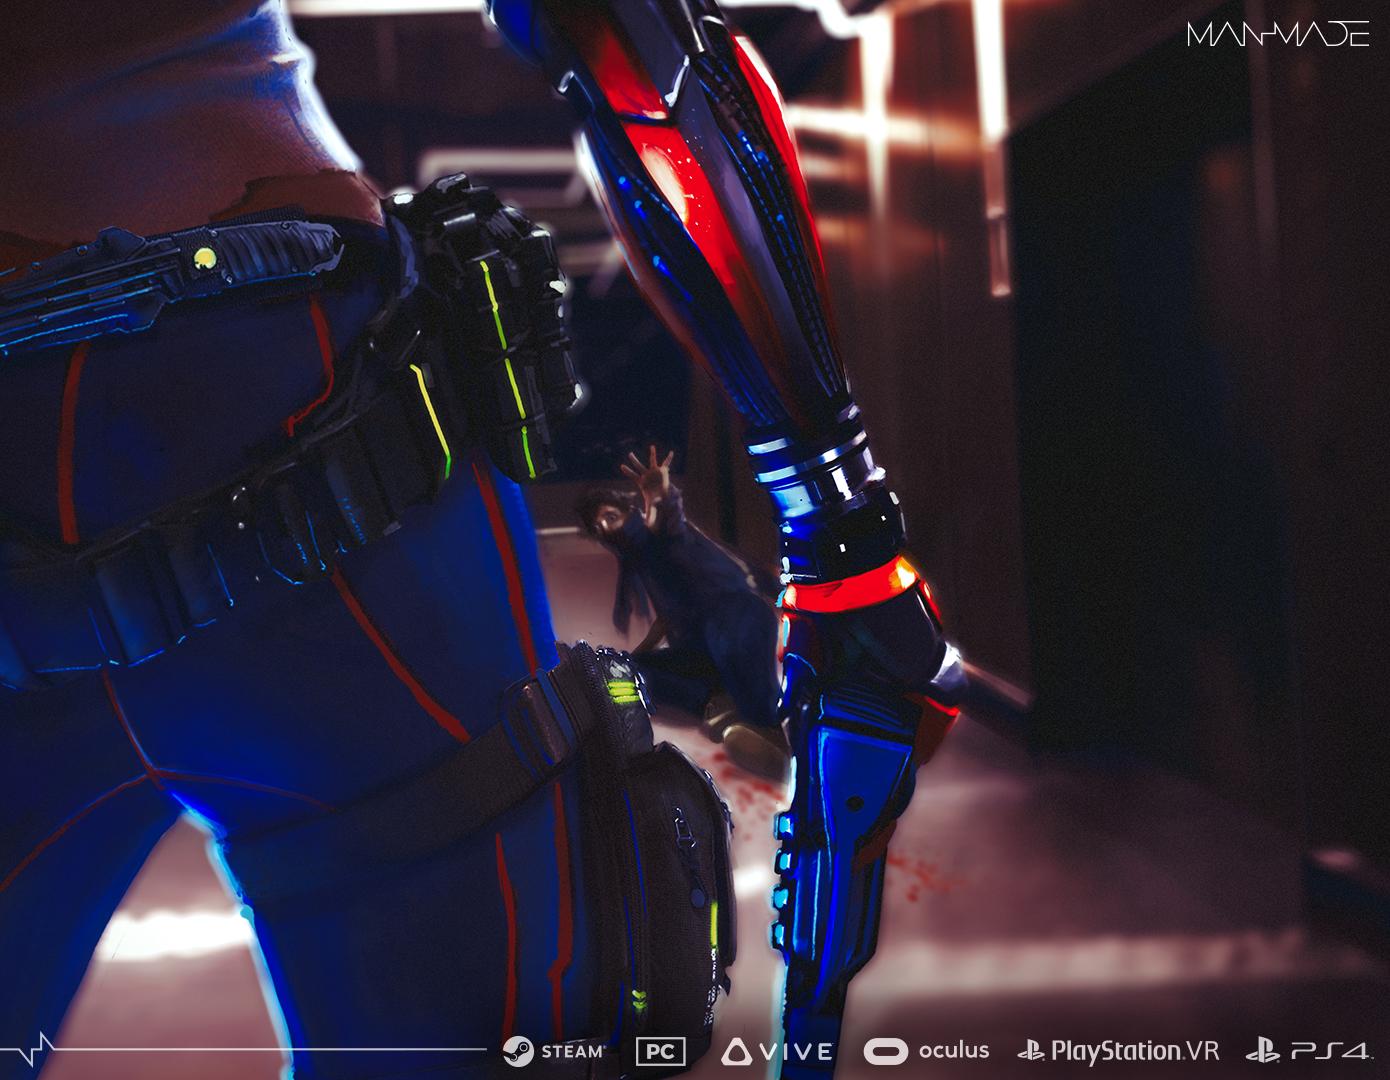 ManMade-Oculus-Rift-HTC-Vive-PlayStation-VR-Kickstarter